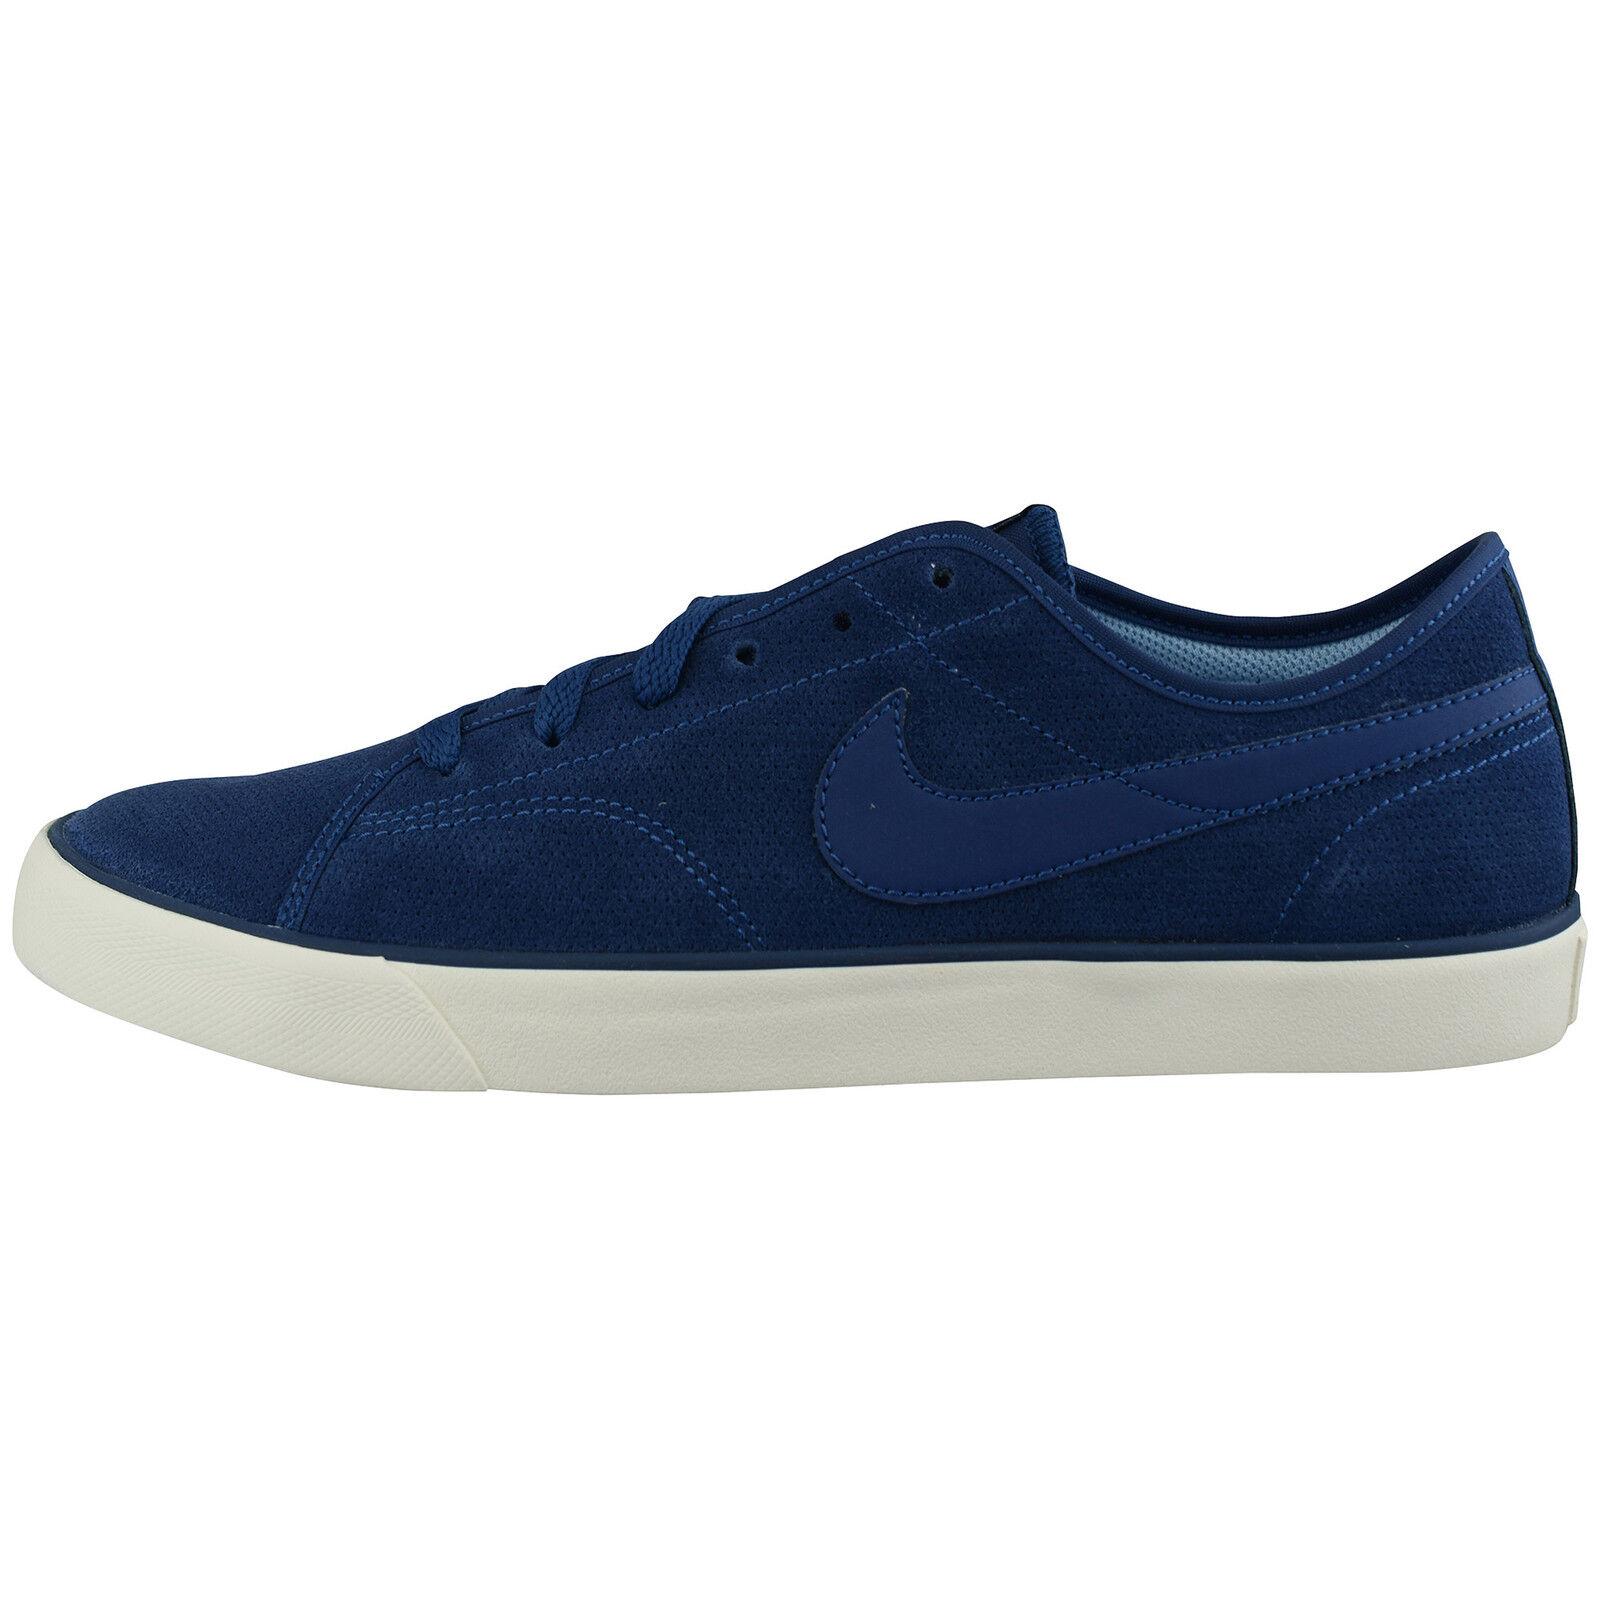 Nike - gericht pelle pelle gericht 644826-440 klassische lifestyle scarpe tempo libero turnschuhe c146b9